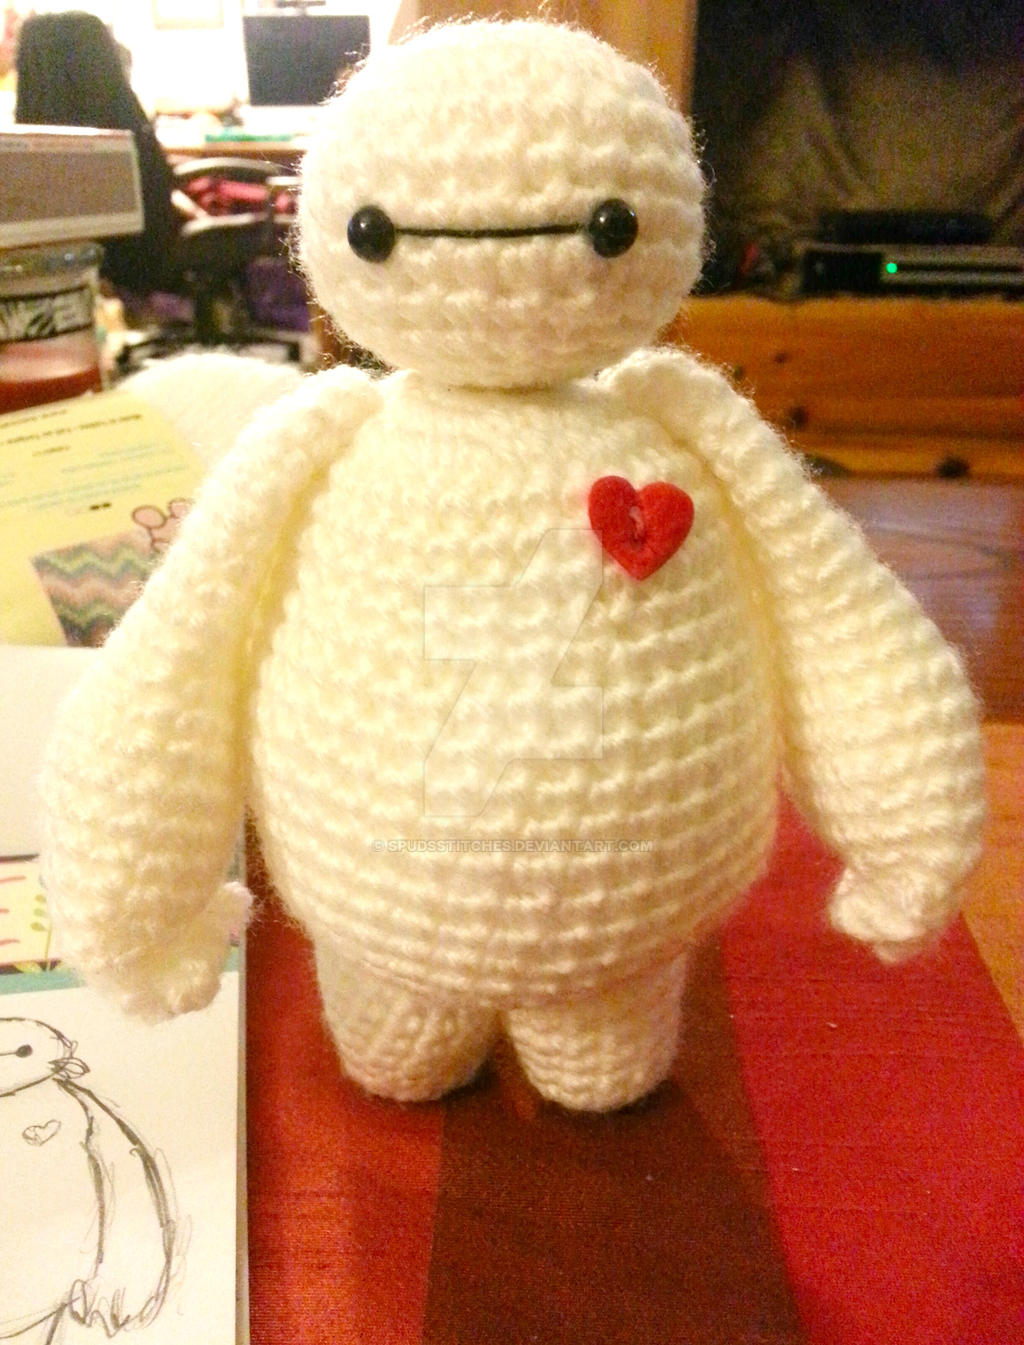 Fiberfill For Big Amigurumi And Crochet Pillows | IraRott Inc. | 1345x1024